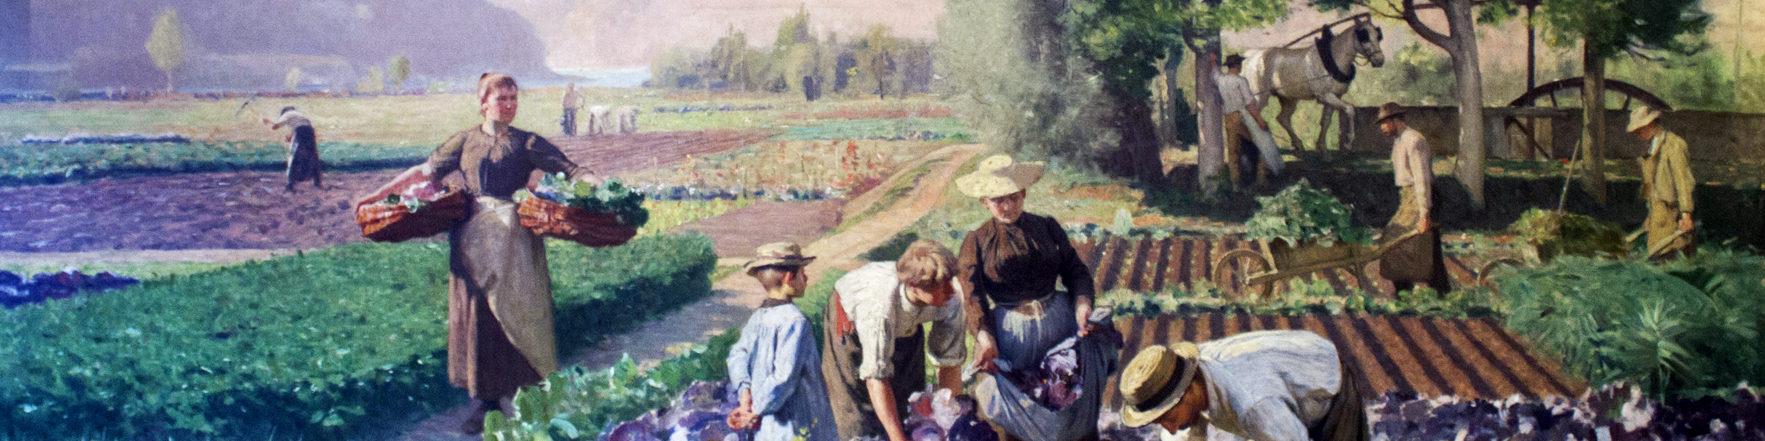 Jardins maraîchers de Plainpalais, Edouard Ravel, 1894.